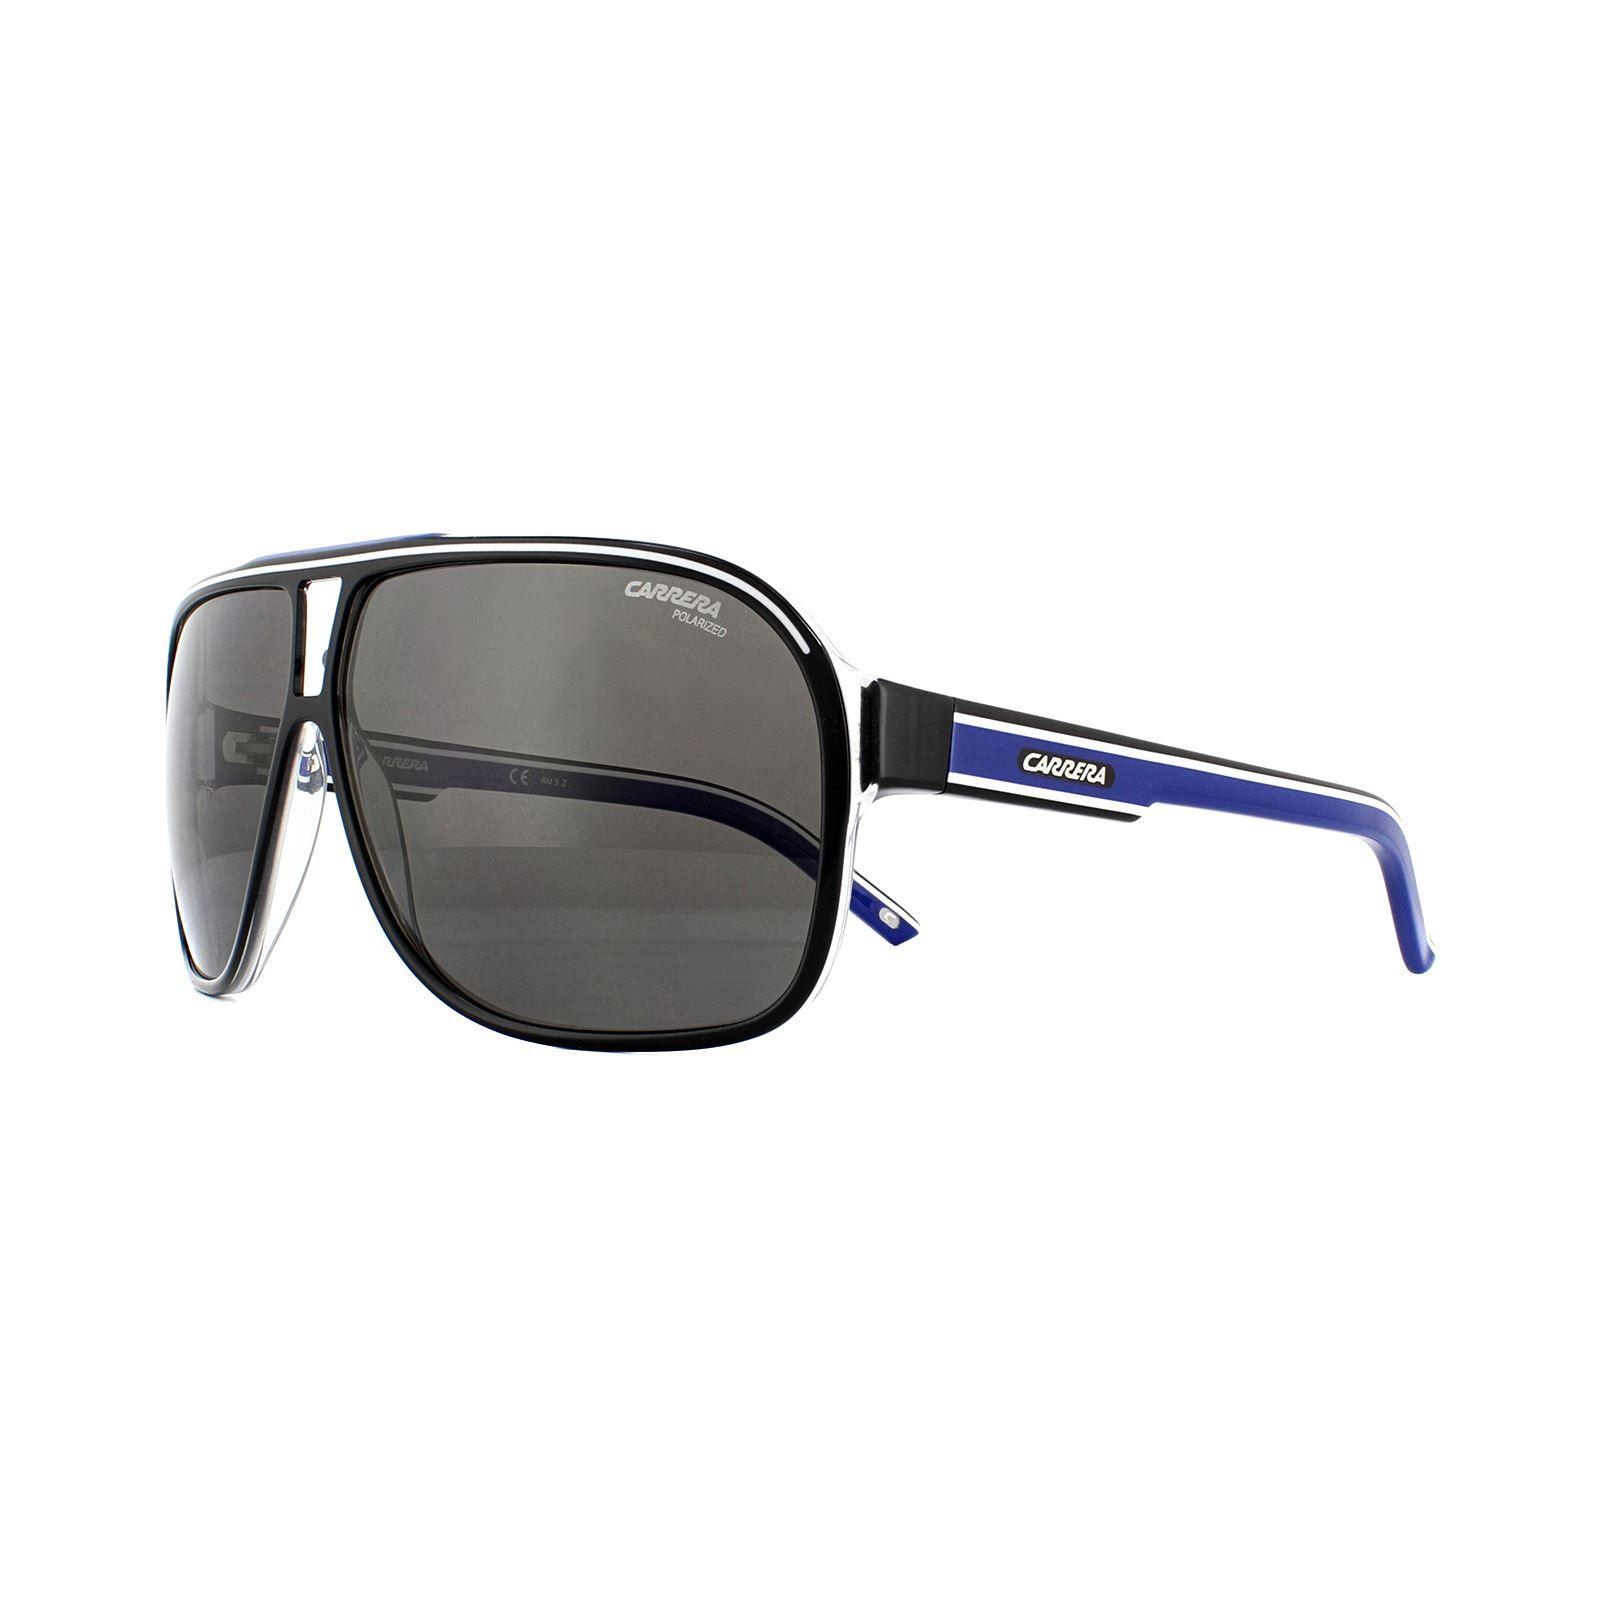 Carrera Sunglasses Grand Prix 2 T5C M9 Black Crystal White Blue Grey Polarized